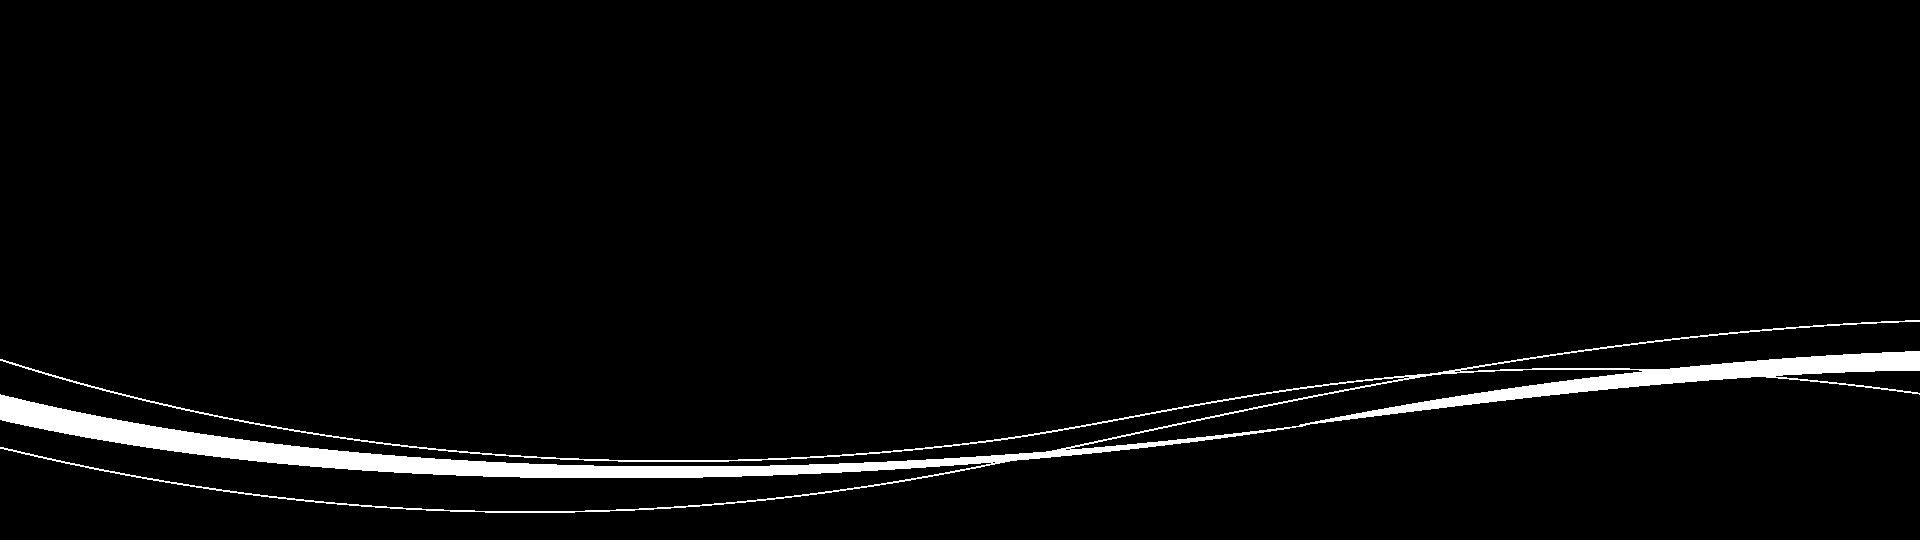 grey_lines_bkg_15